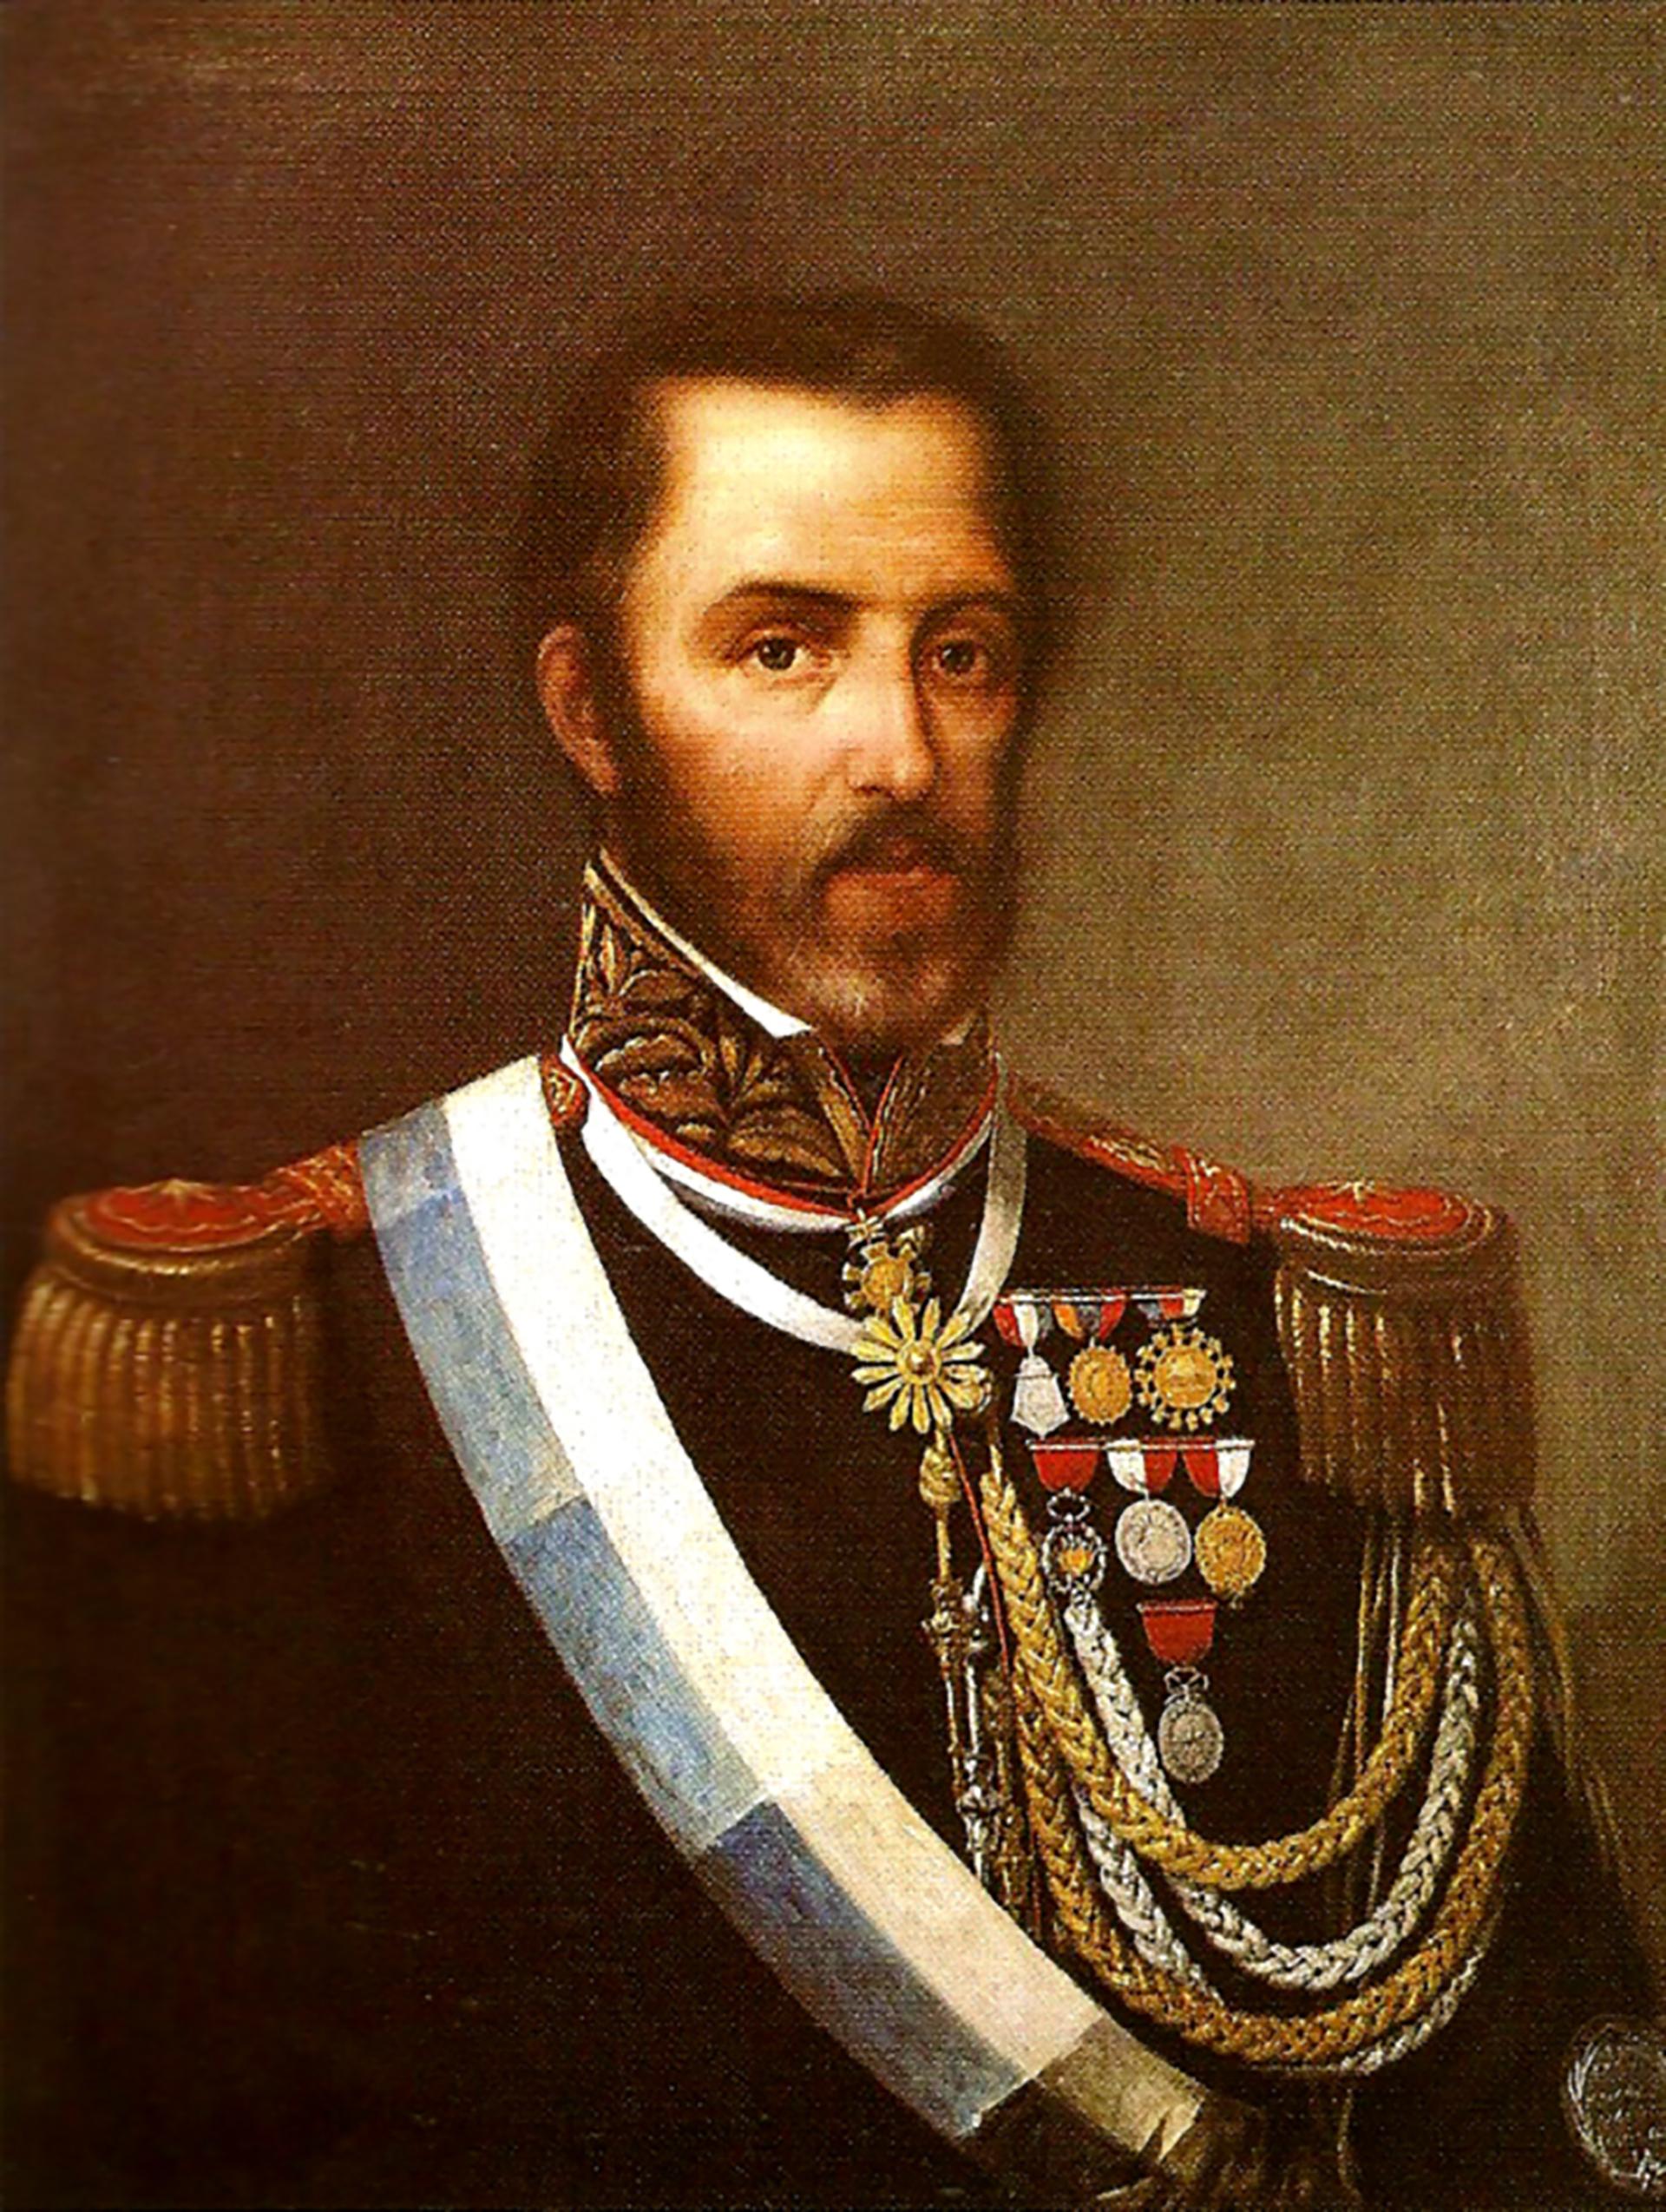 Juan Lavalle, otro de los próceres que participó de la Batalla de Ituzaingó